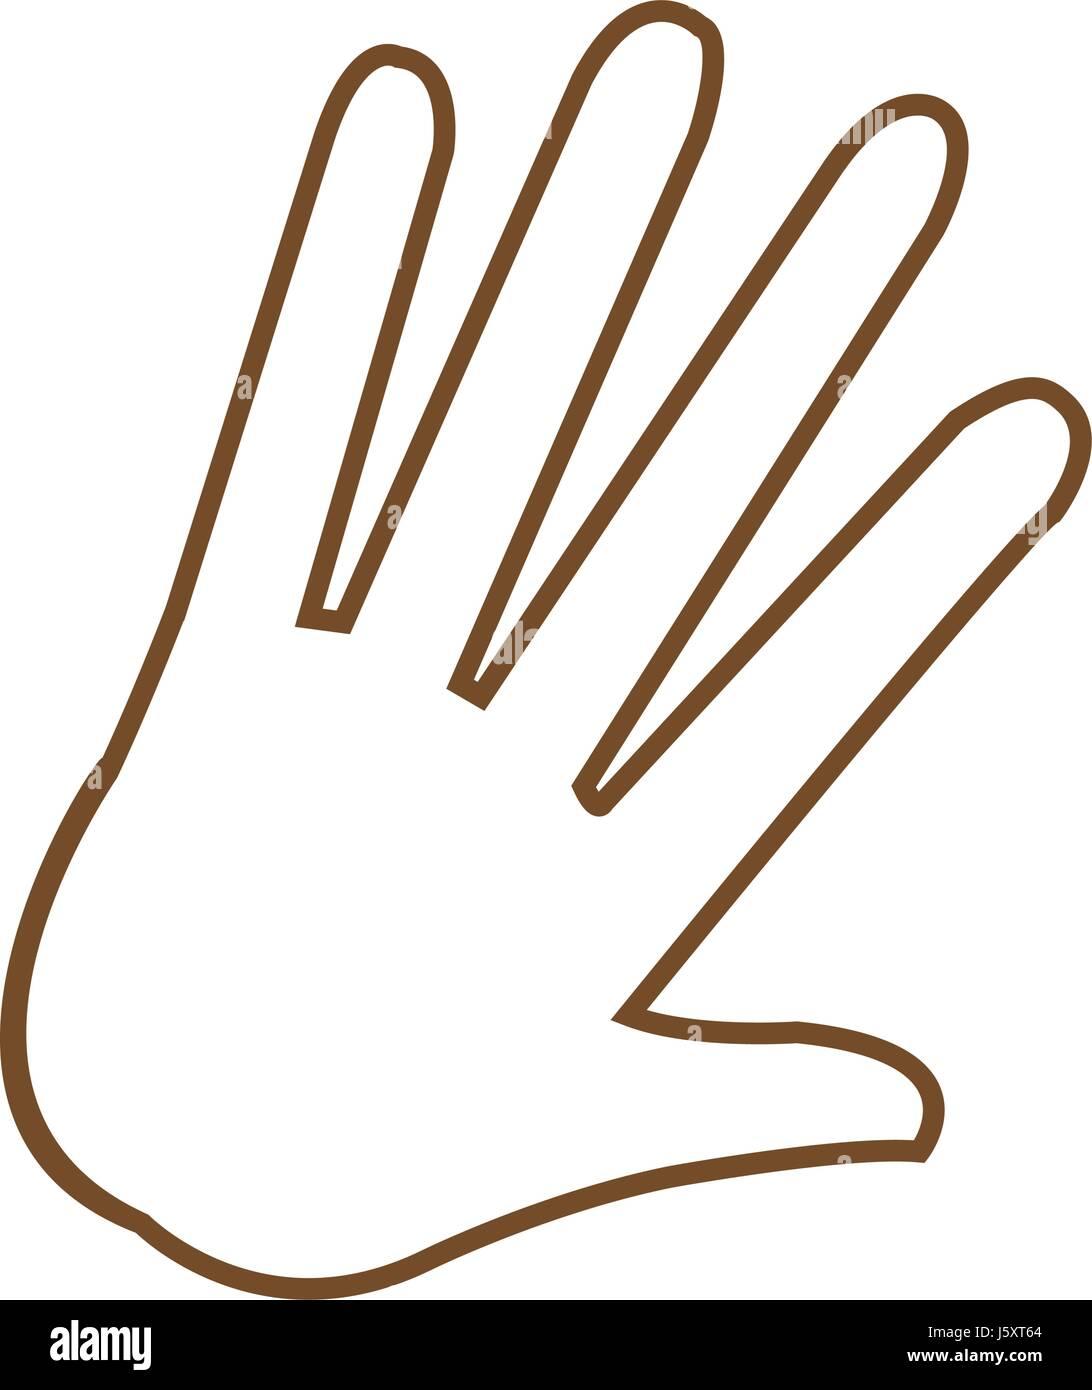 hand palm human symbol image - Stock Vector